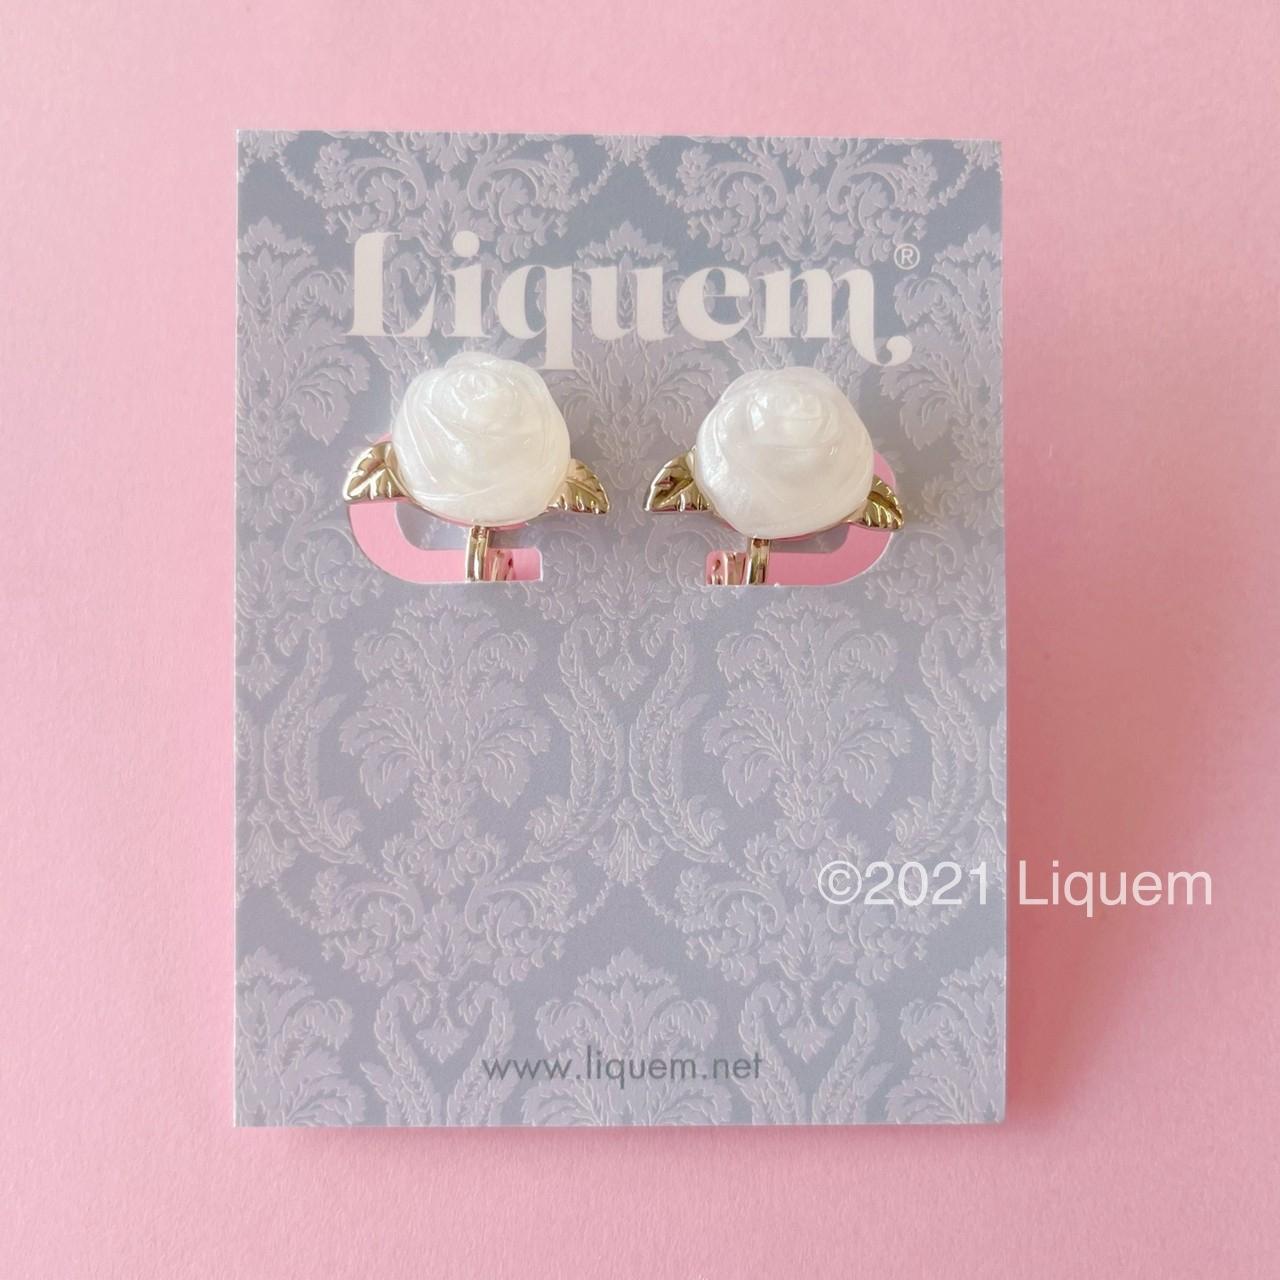 Liquem / プチローズイヤリング(ホワイトローズ)